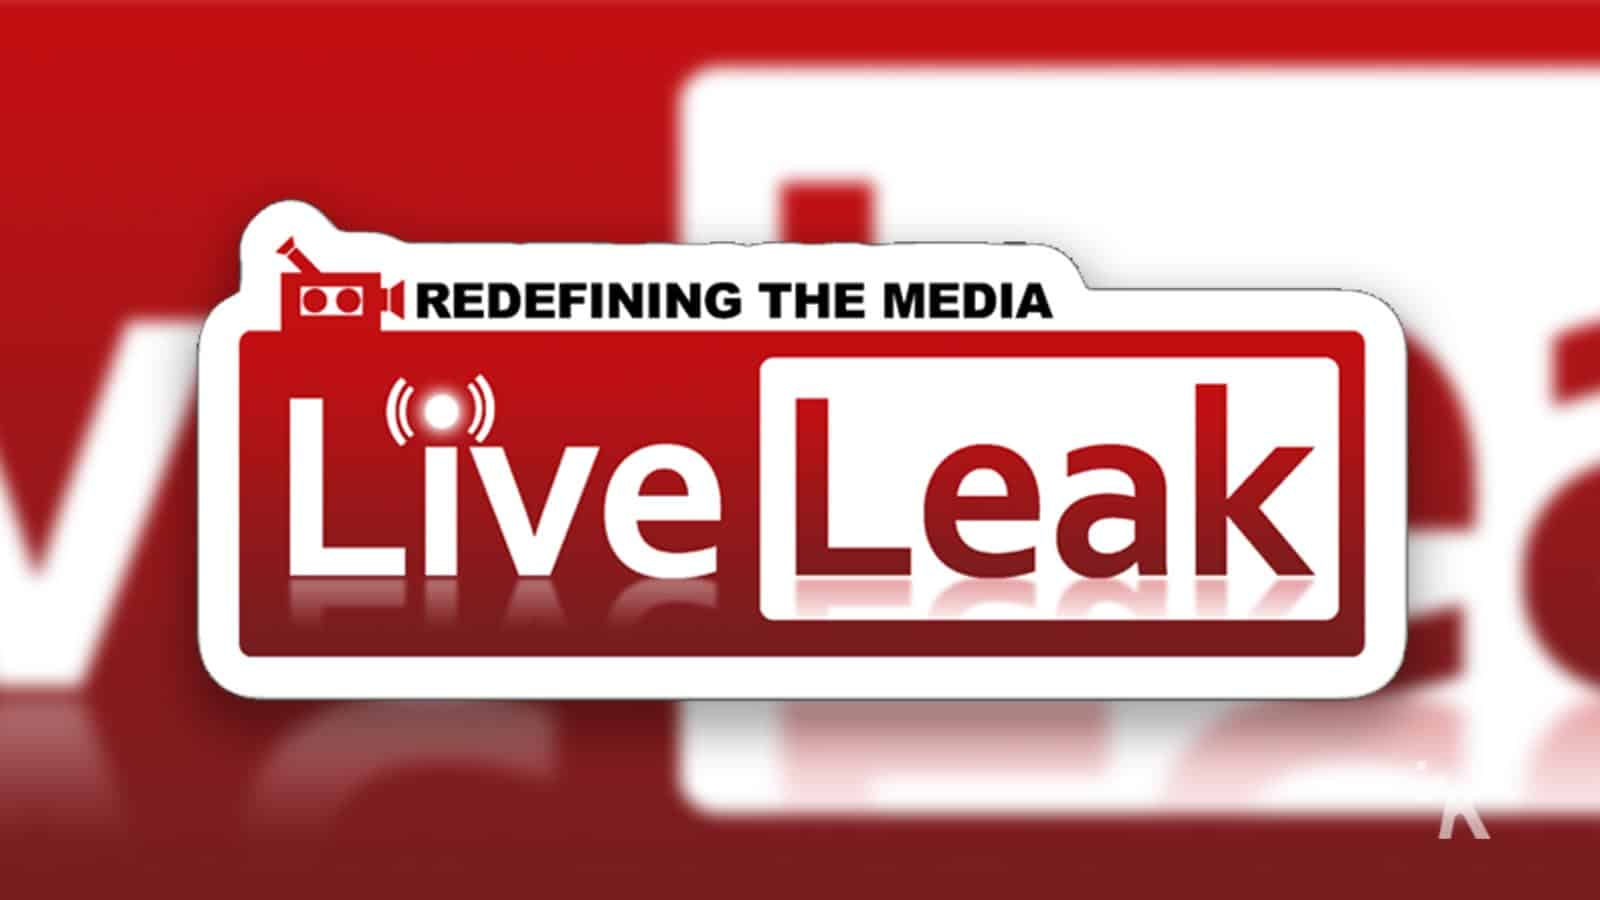 liveleak logo with blurred background